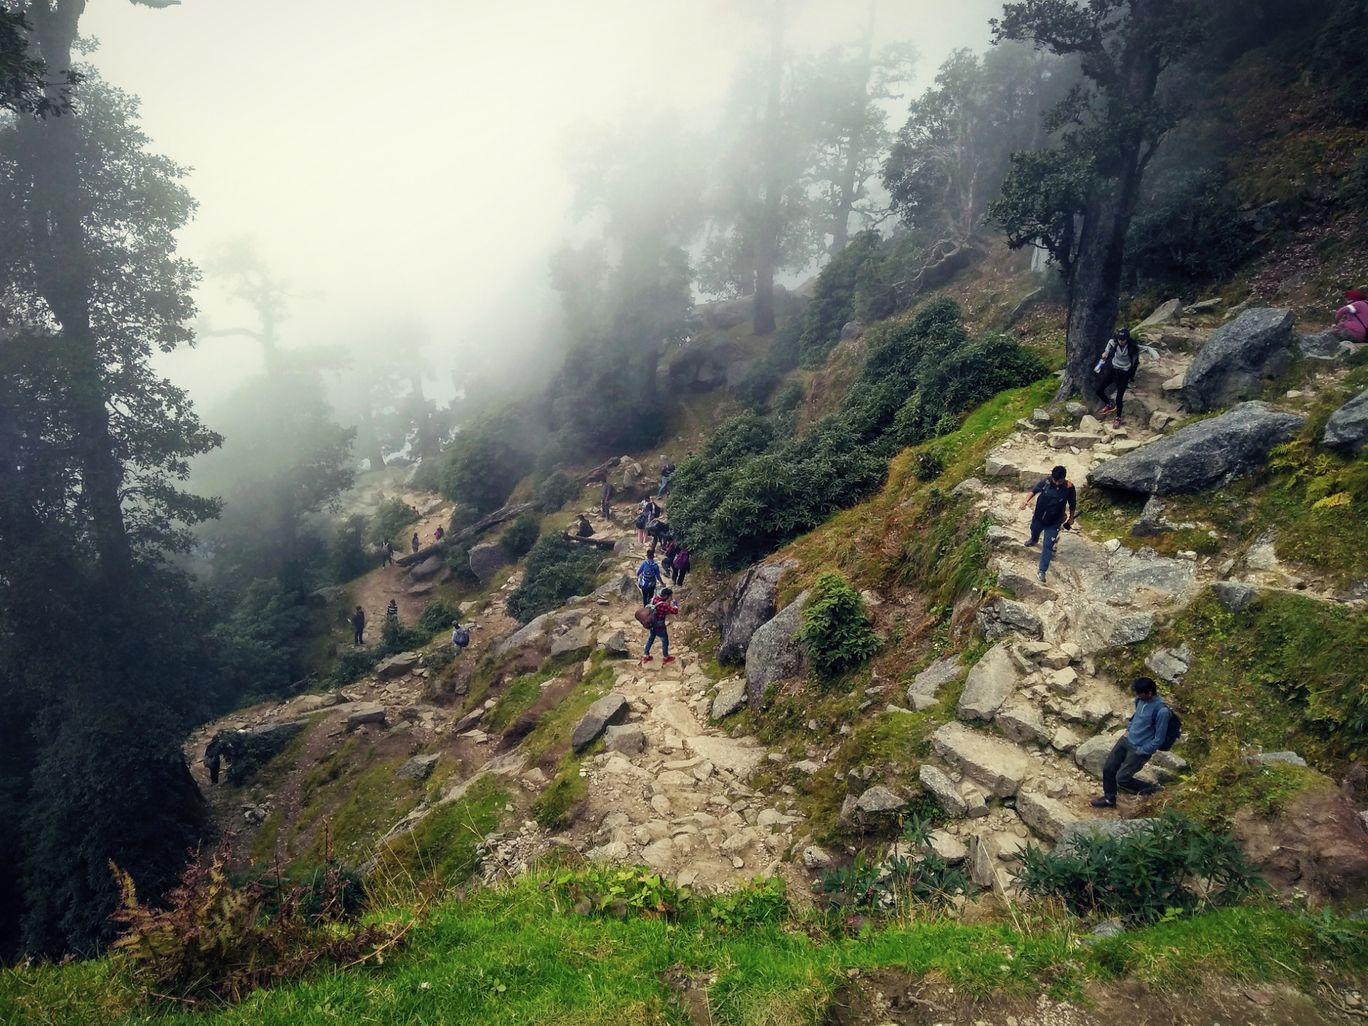 Photo of Triund Trek By abul abbas Azad